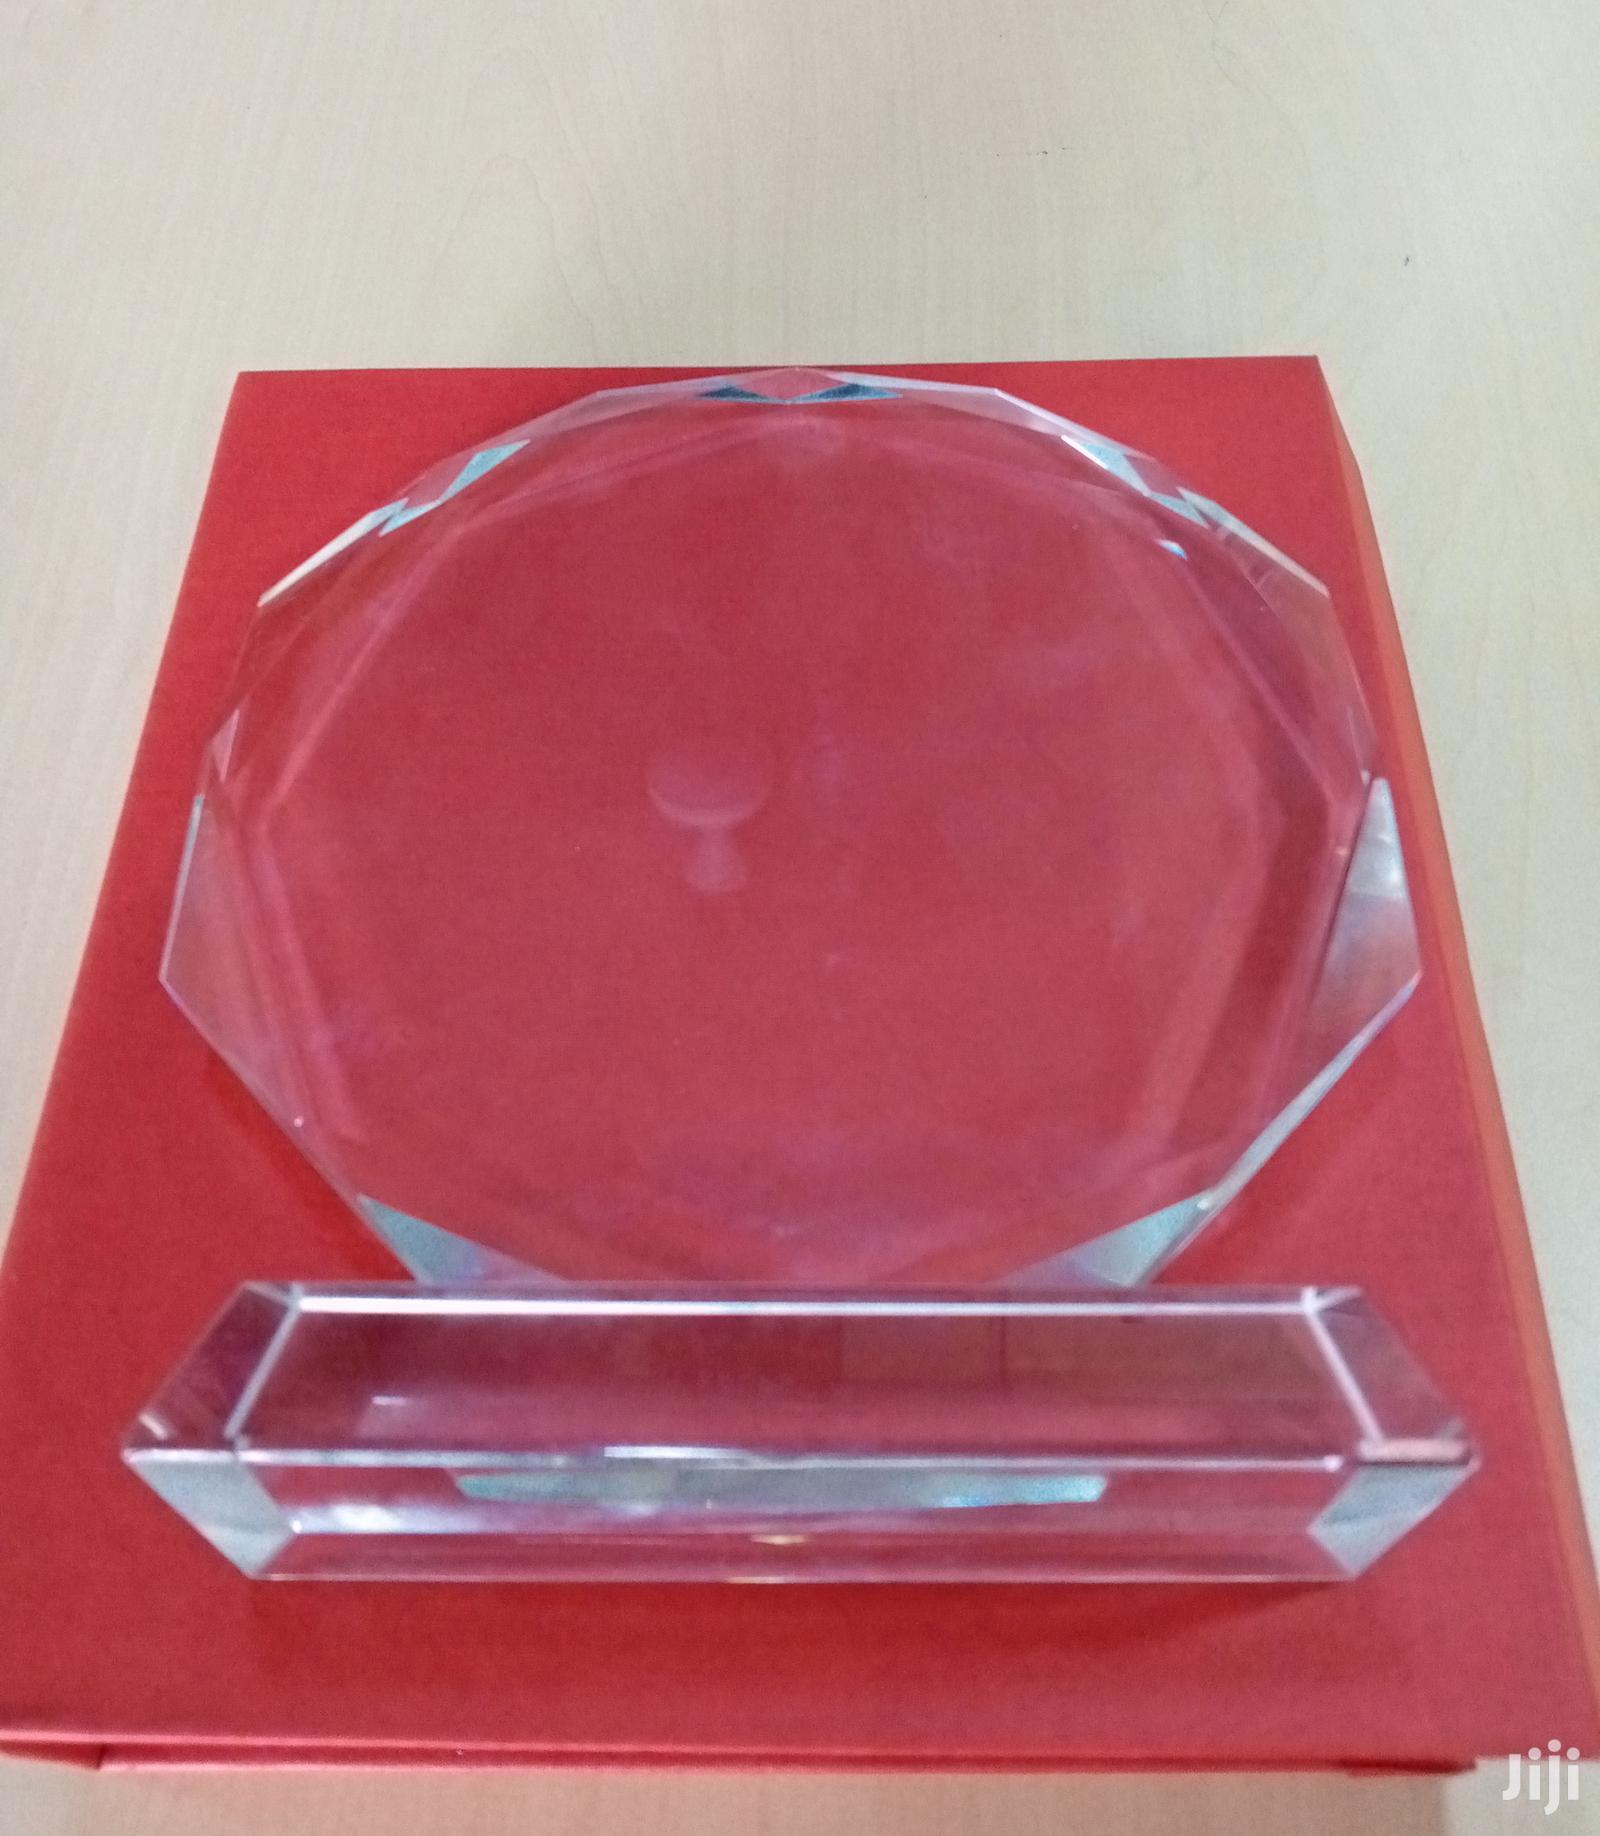 Crstal Award Plaque